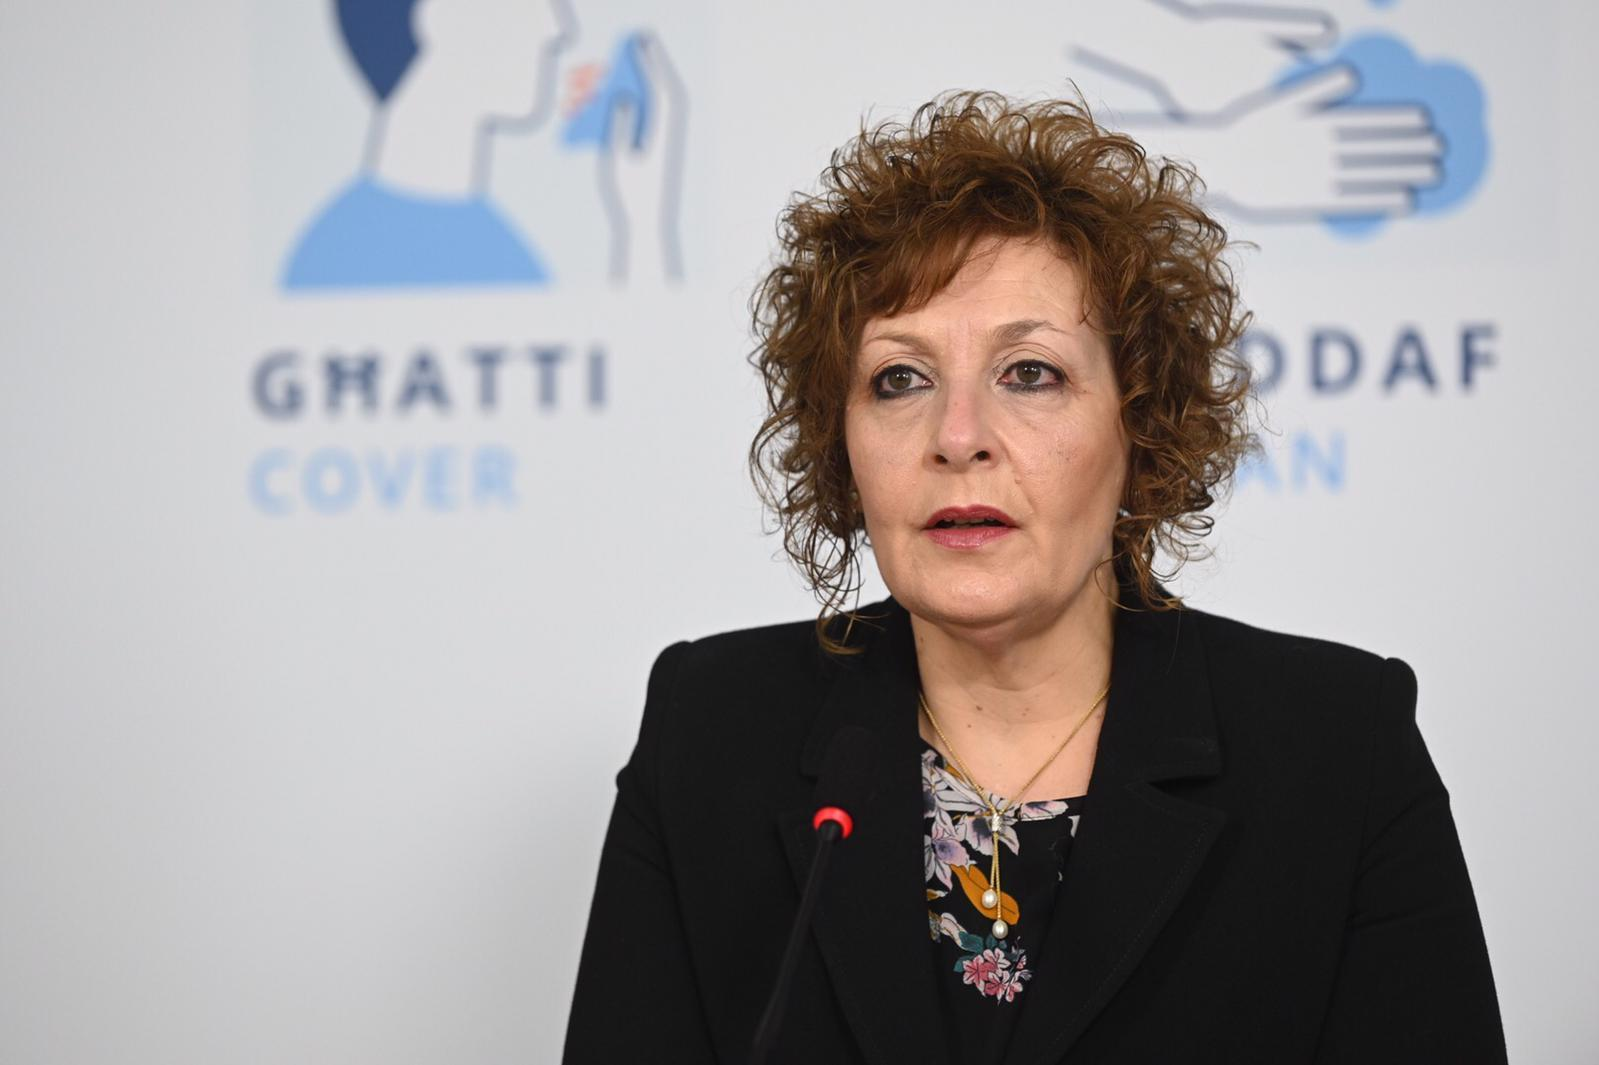 Prof. Charmaine Gauci